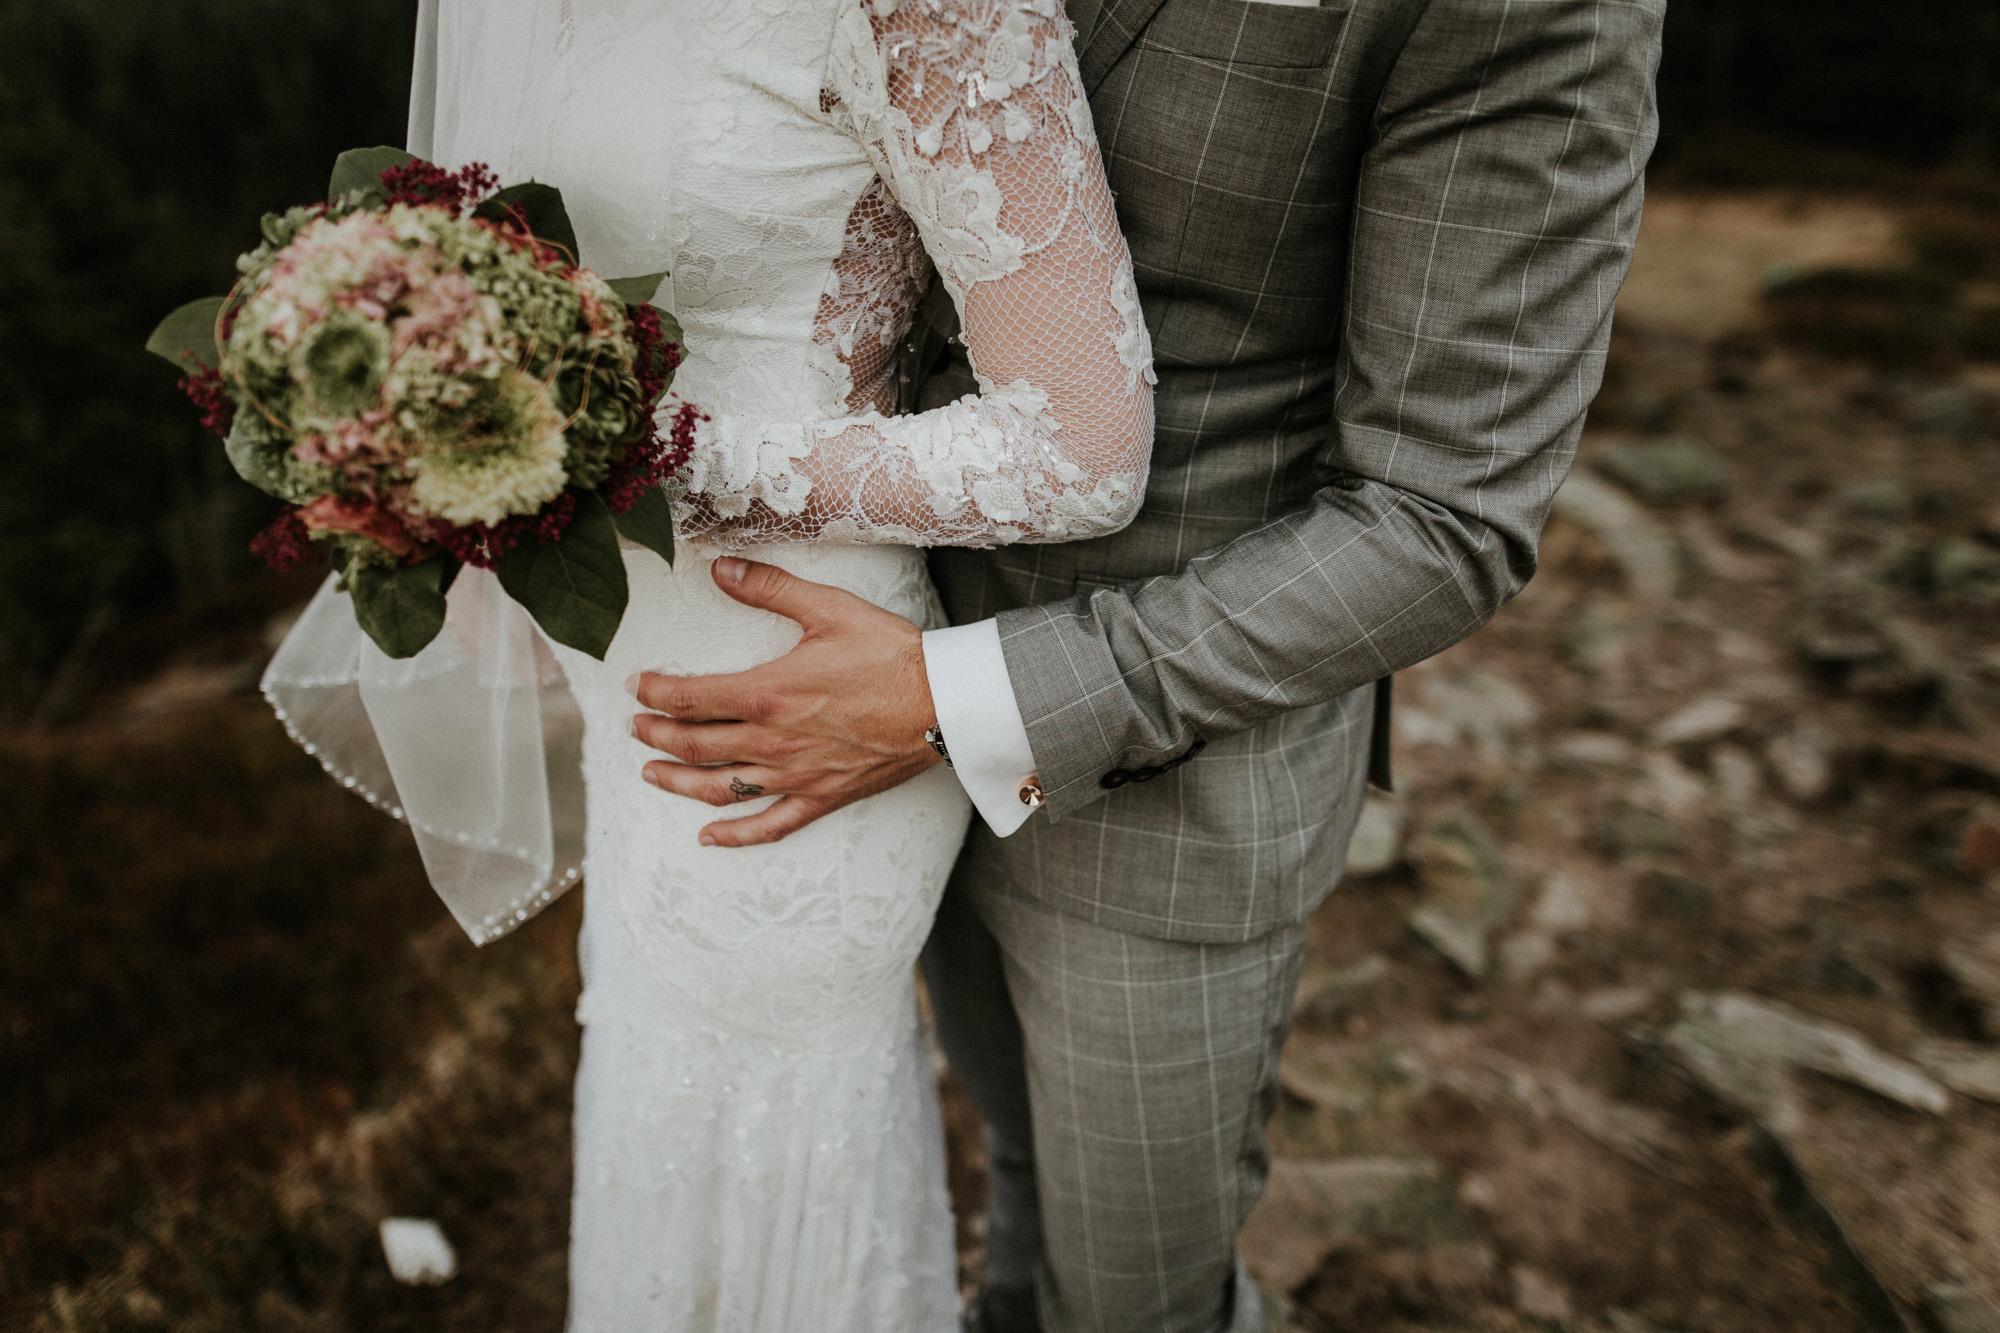 DanielaMarquardtPhotography_Hochzeitsfotograf_Düsseldorf_Köln_Mallorca_Bayern_Austria_Harz_LinaundMaik_Afterwedding-Shooting_Weddingphotographer_Ibiza_Tuskany_Italien_Toskana41